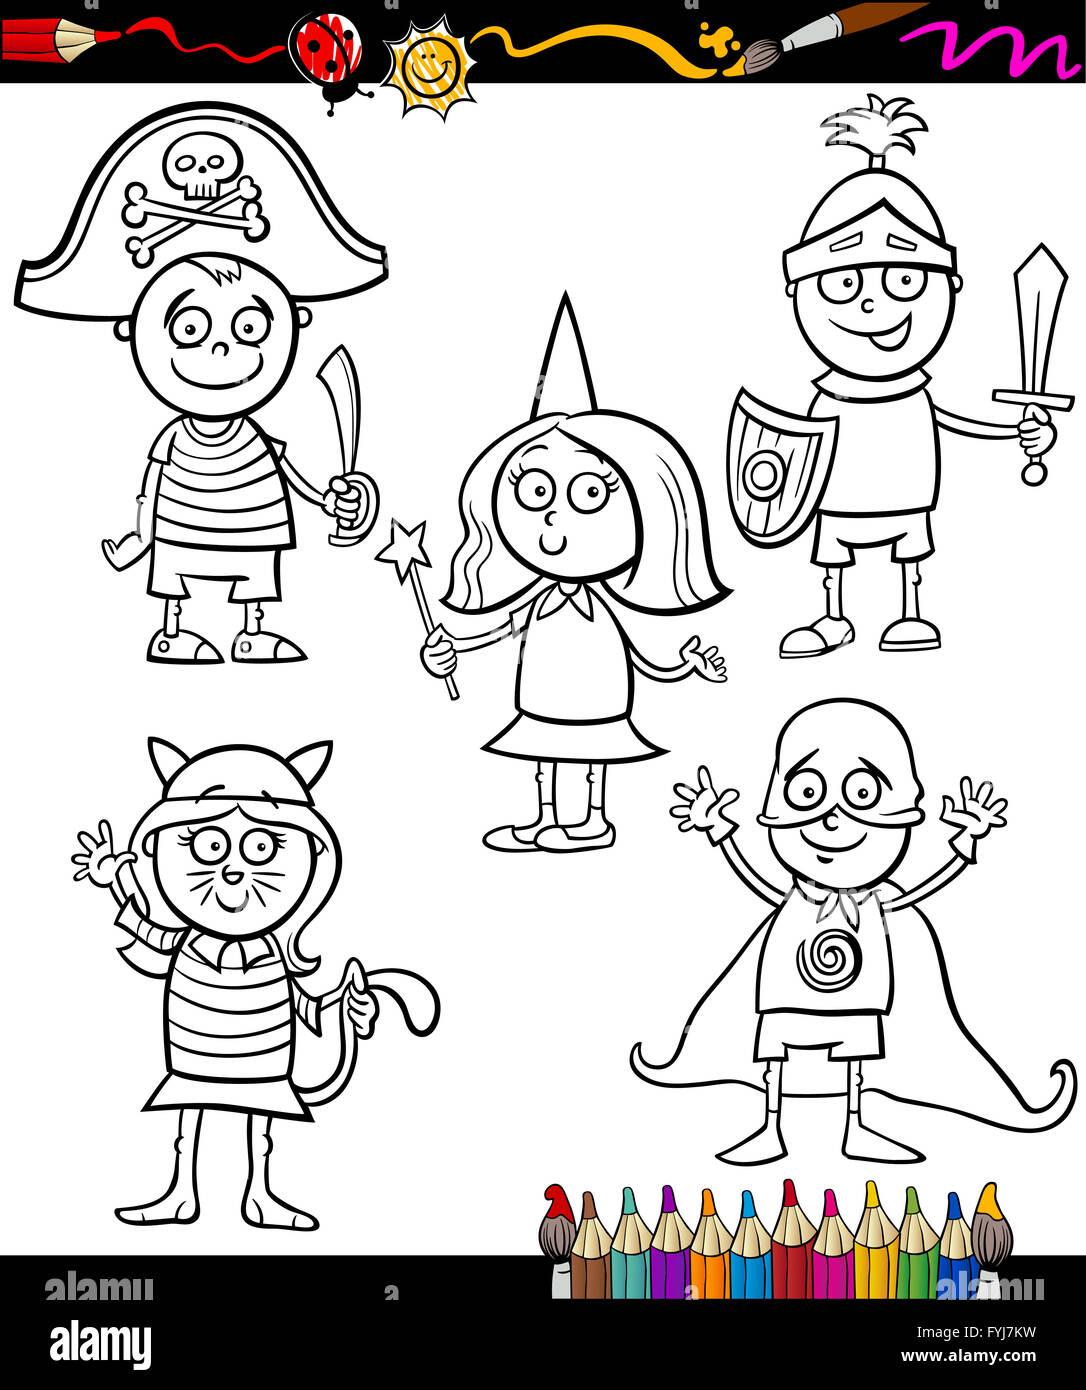 Knight Sword Cartoon Coloring Page Stockfotos & Knight Sword Cartoon ...